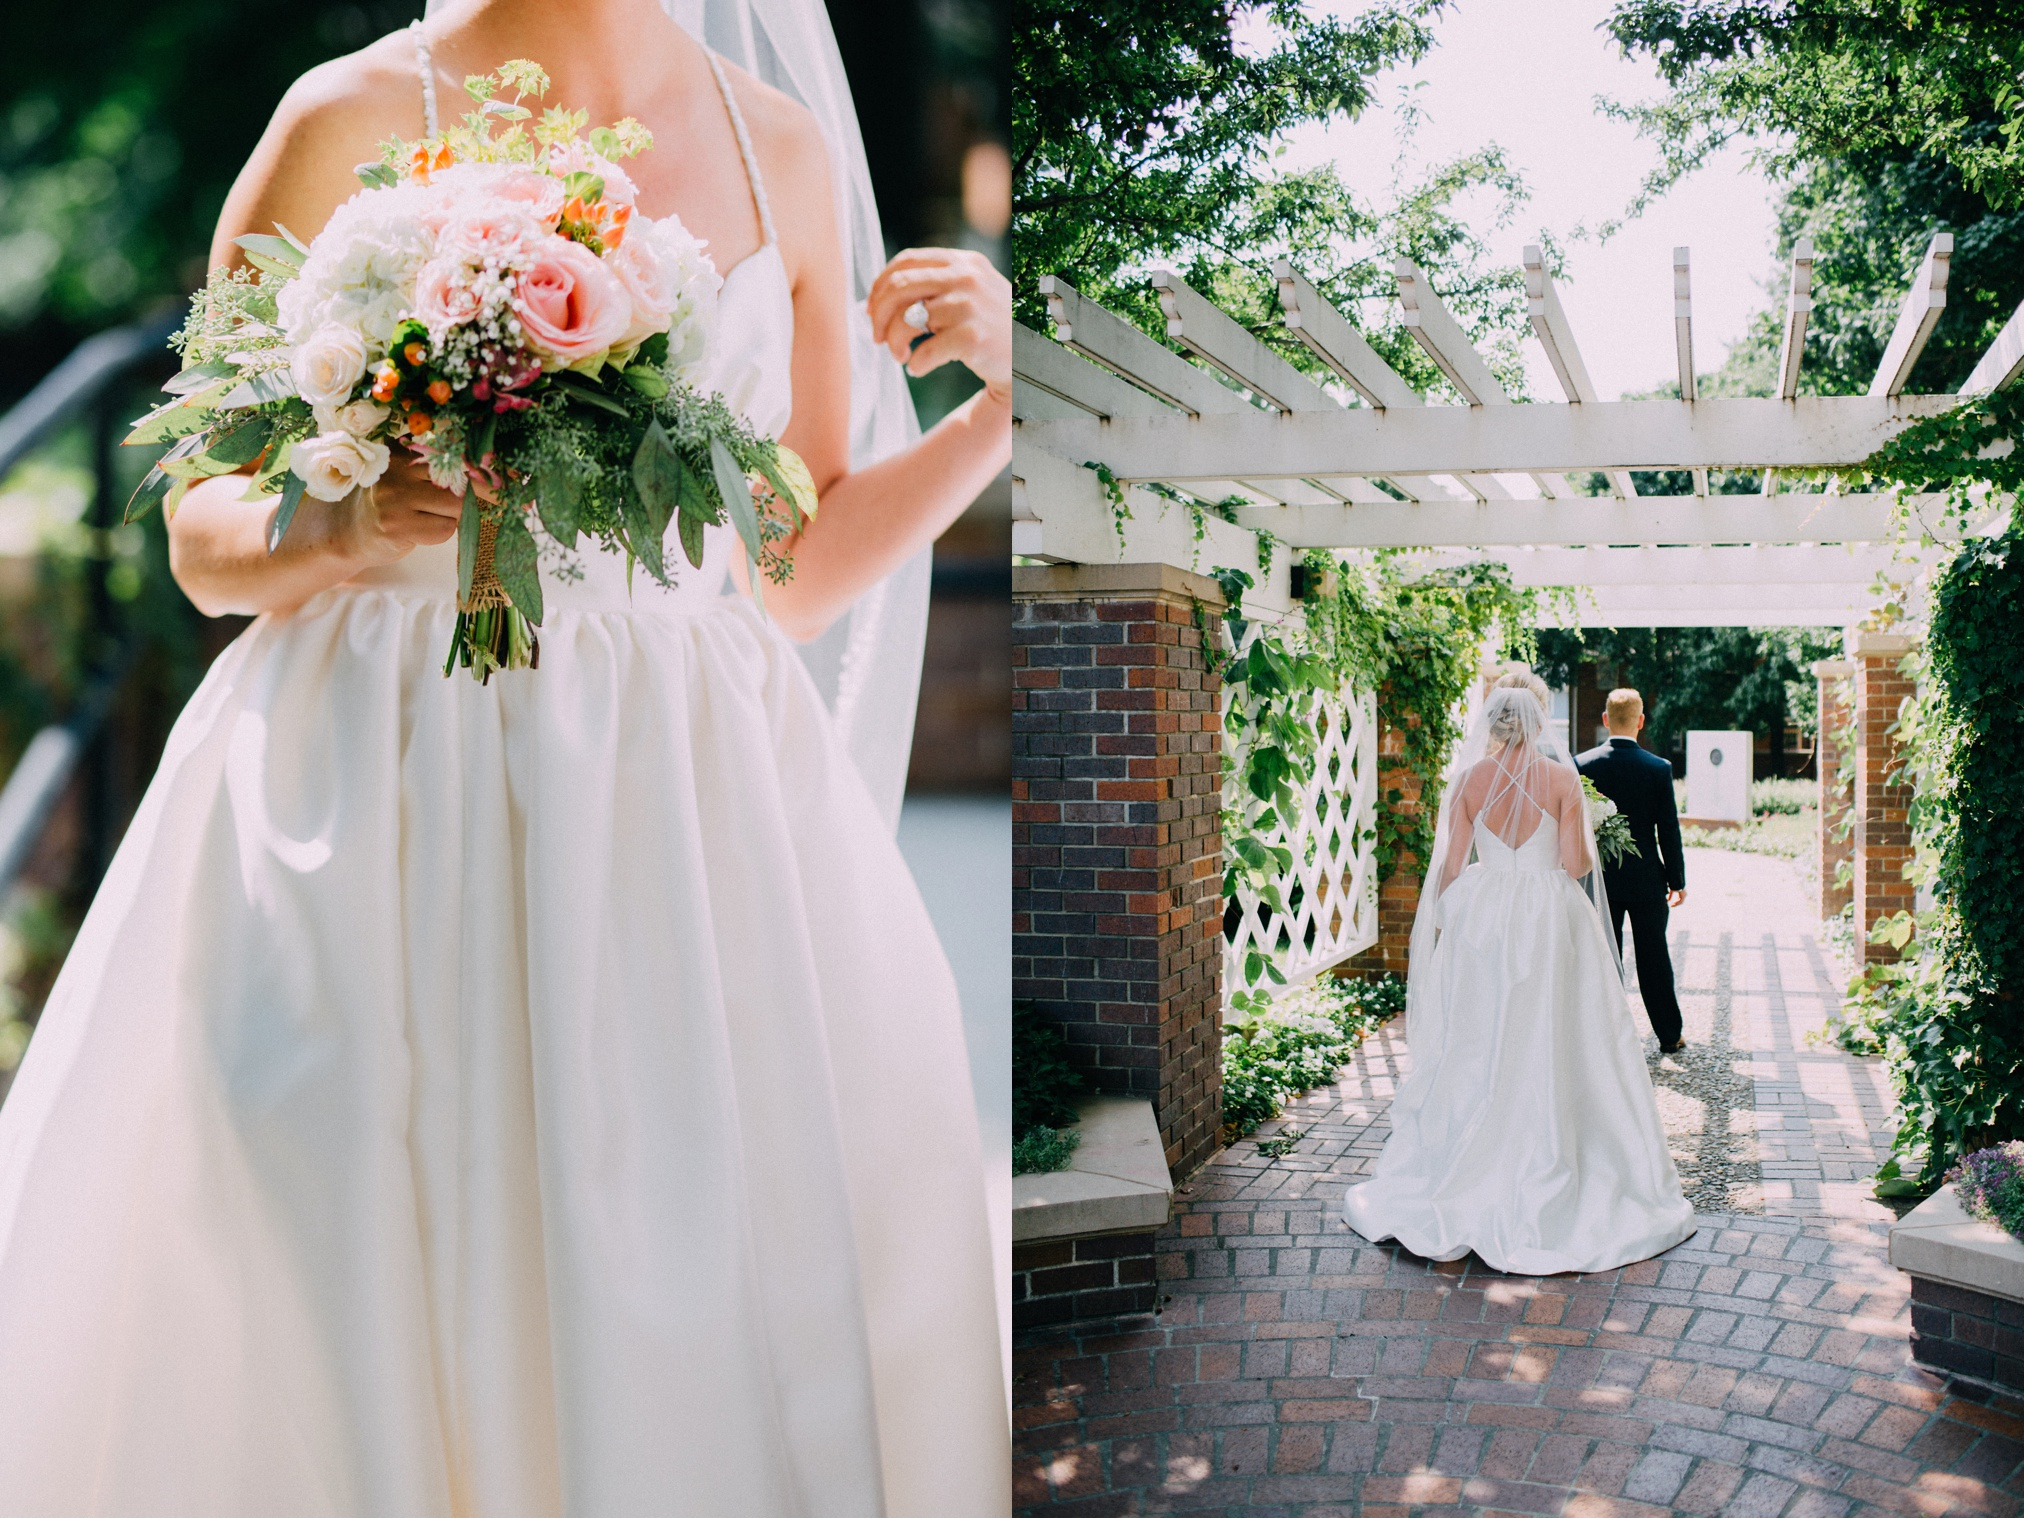 brenna+michael_wedding-244.jpg